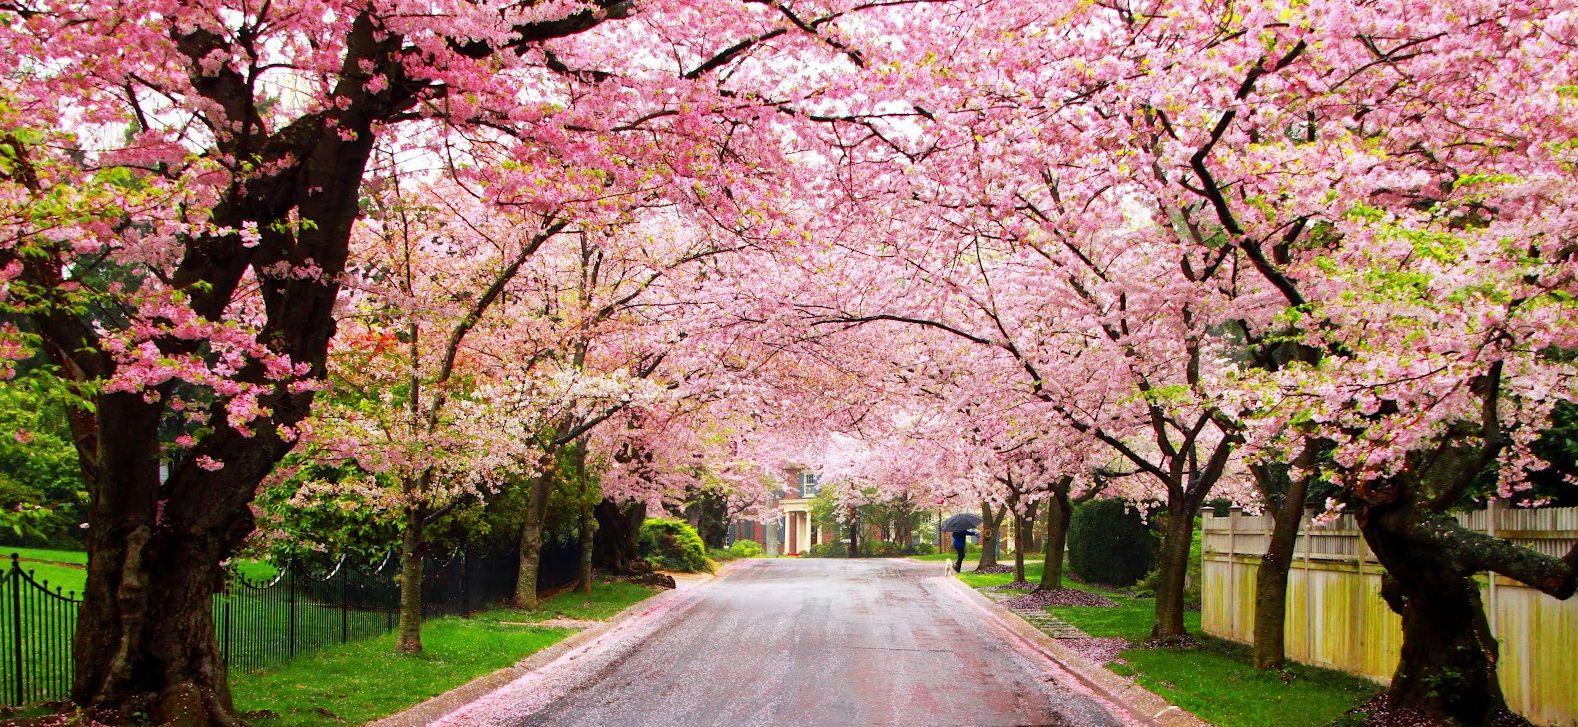 What A Beautiful Sight Cherryblossoms Cherry Blossoms Flowers Floweringtrees Spring Springtime Easter R Paisajes Traduccion Al Espanol Arte Paisajes